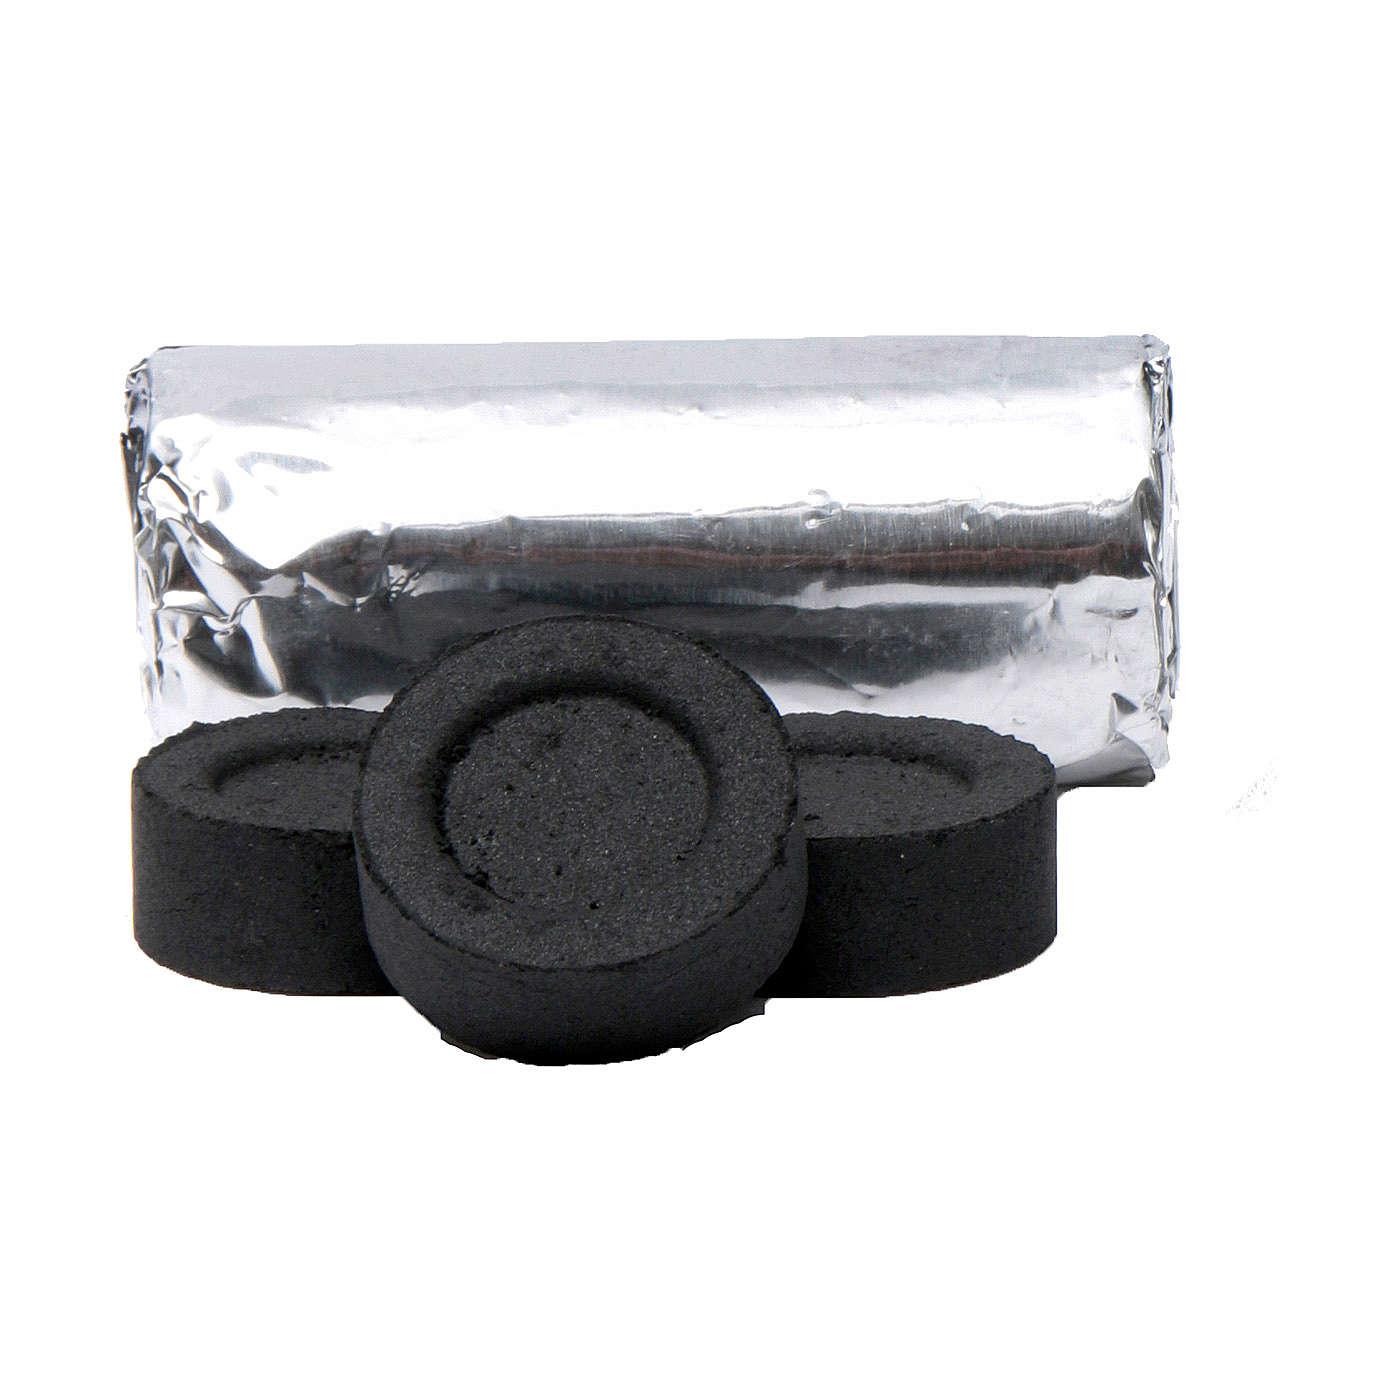 Carboncini bruciaincenso greci diam. 2,7 cm - 114 pz - 45 min 3